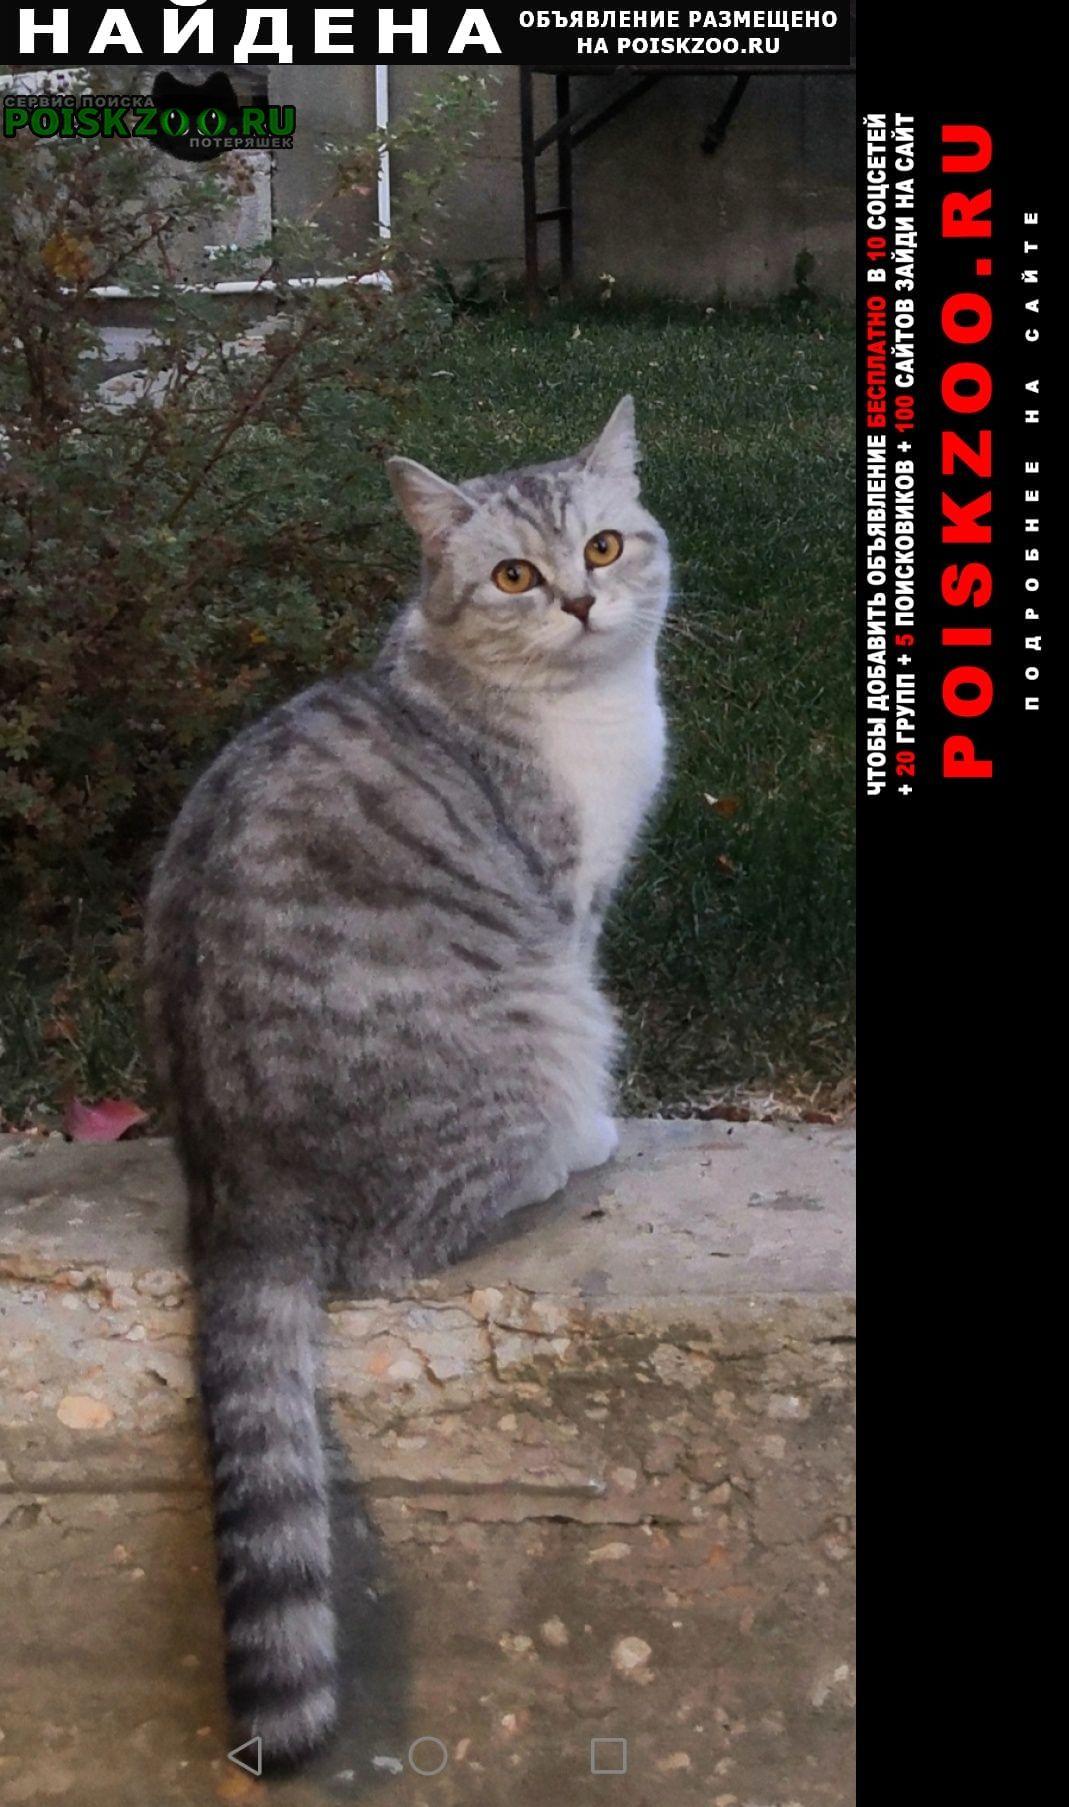 Найдена кошка аврора промышленности Самара